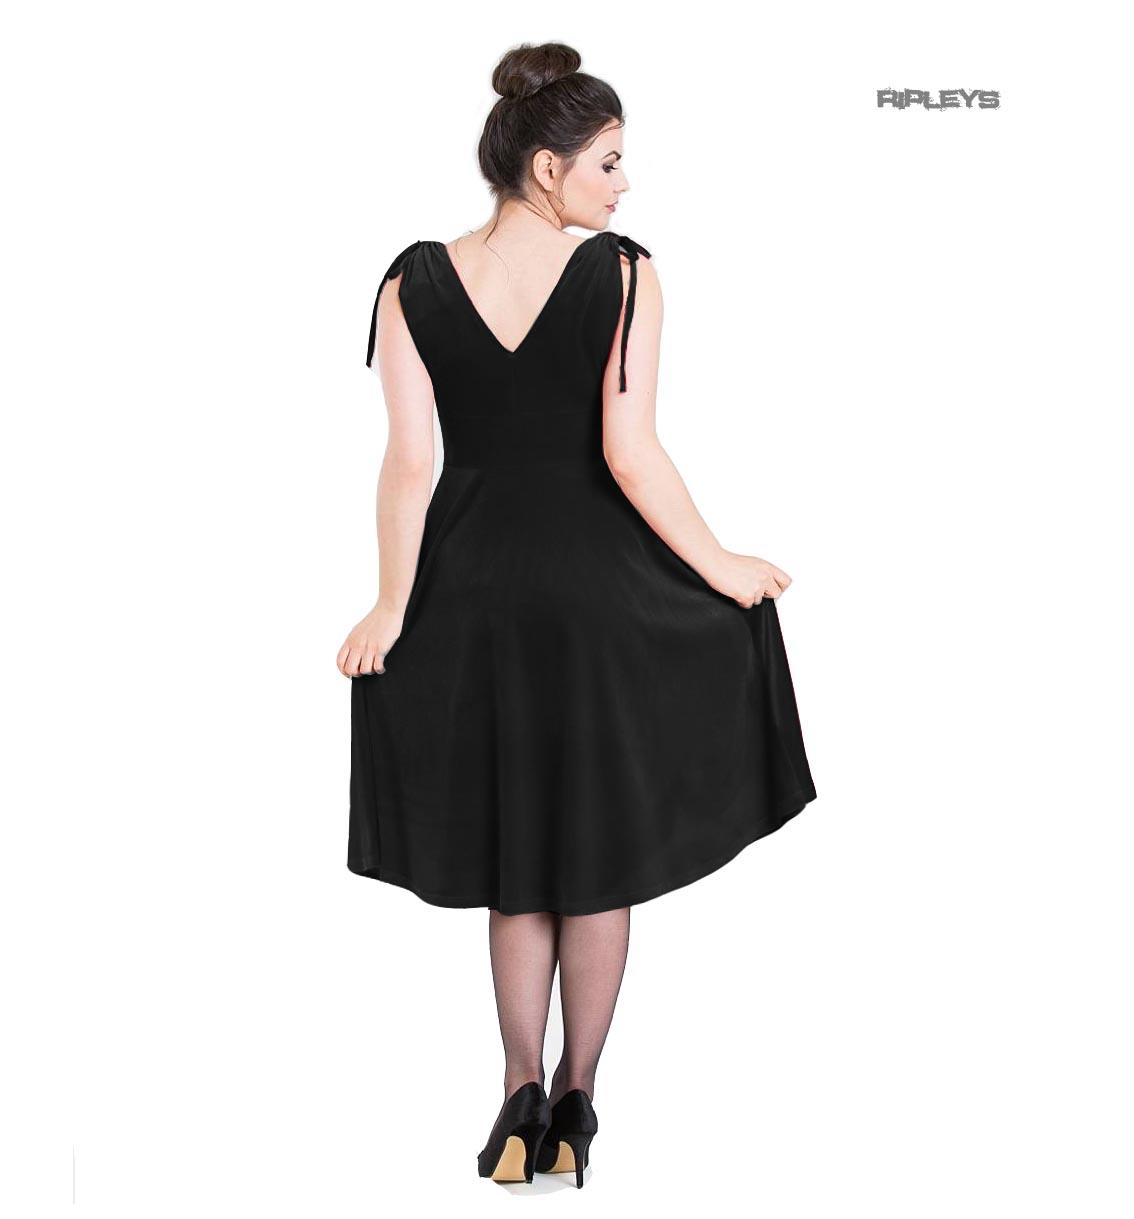 Hell-Bunny-40s-50s-Elegant-Pin-Up-Dress-MELINA-Crushed-Velvet-Black-All-Sizes thumbnail 16